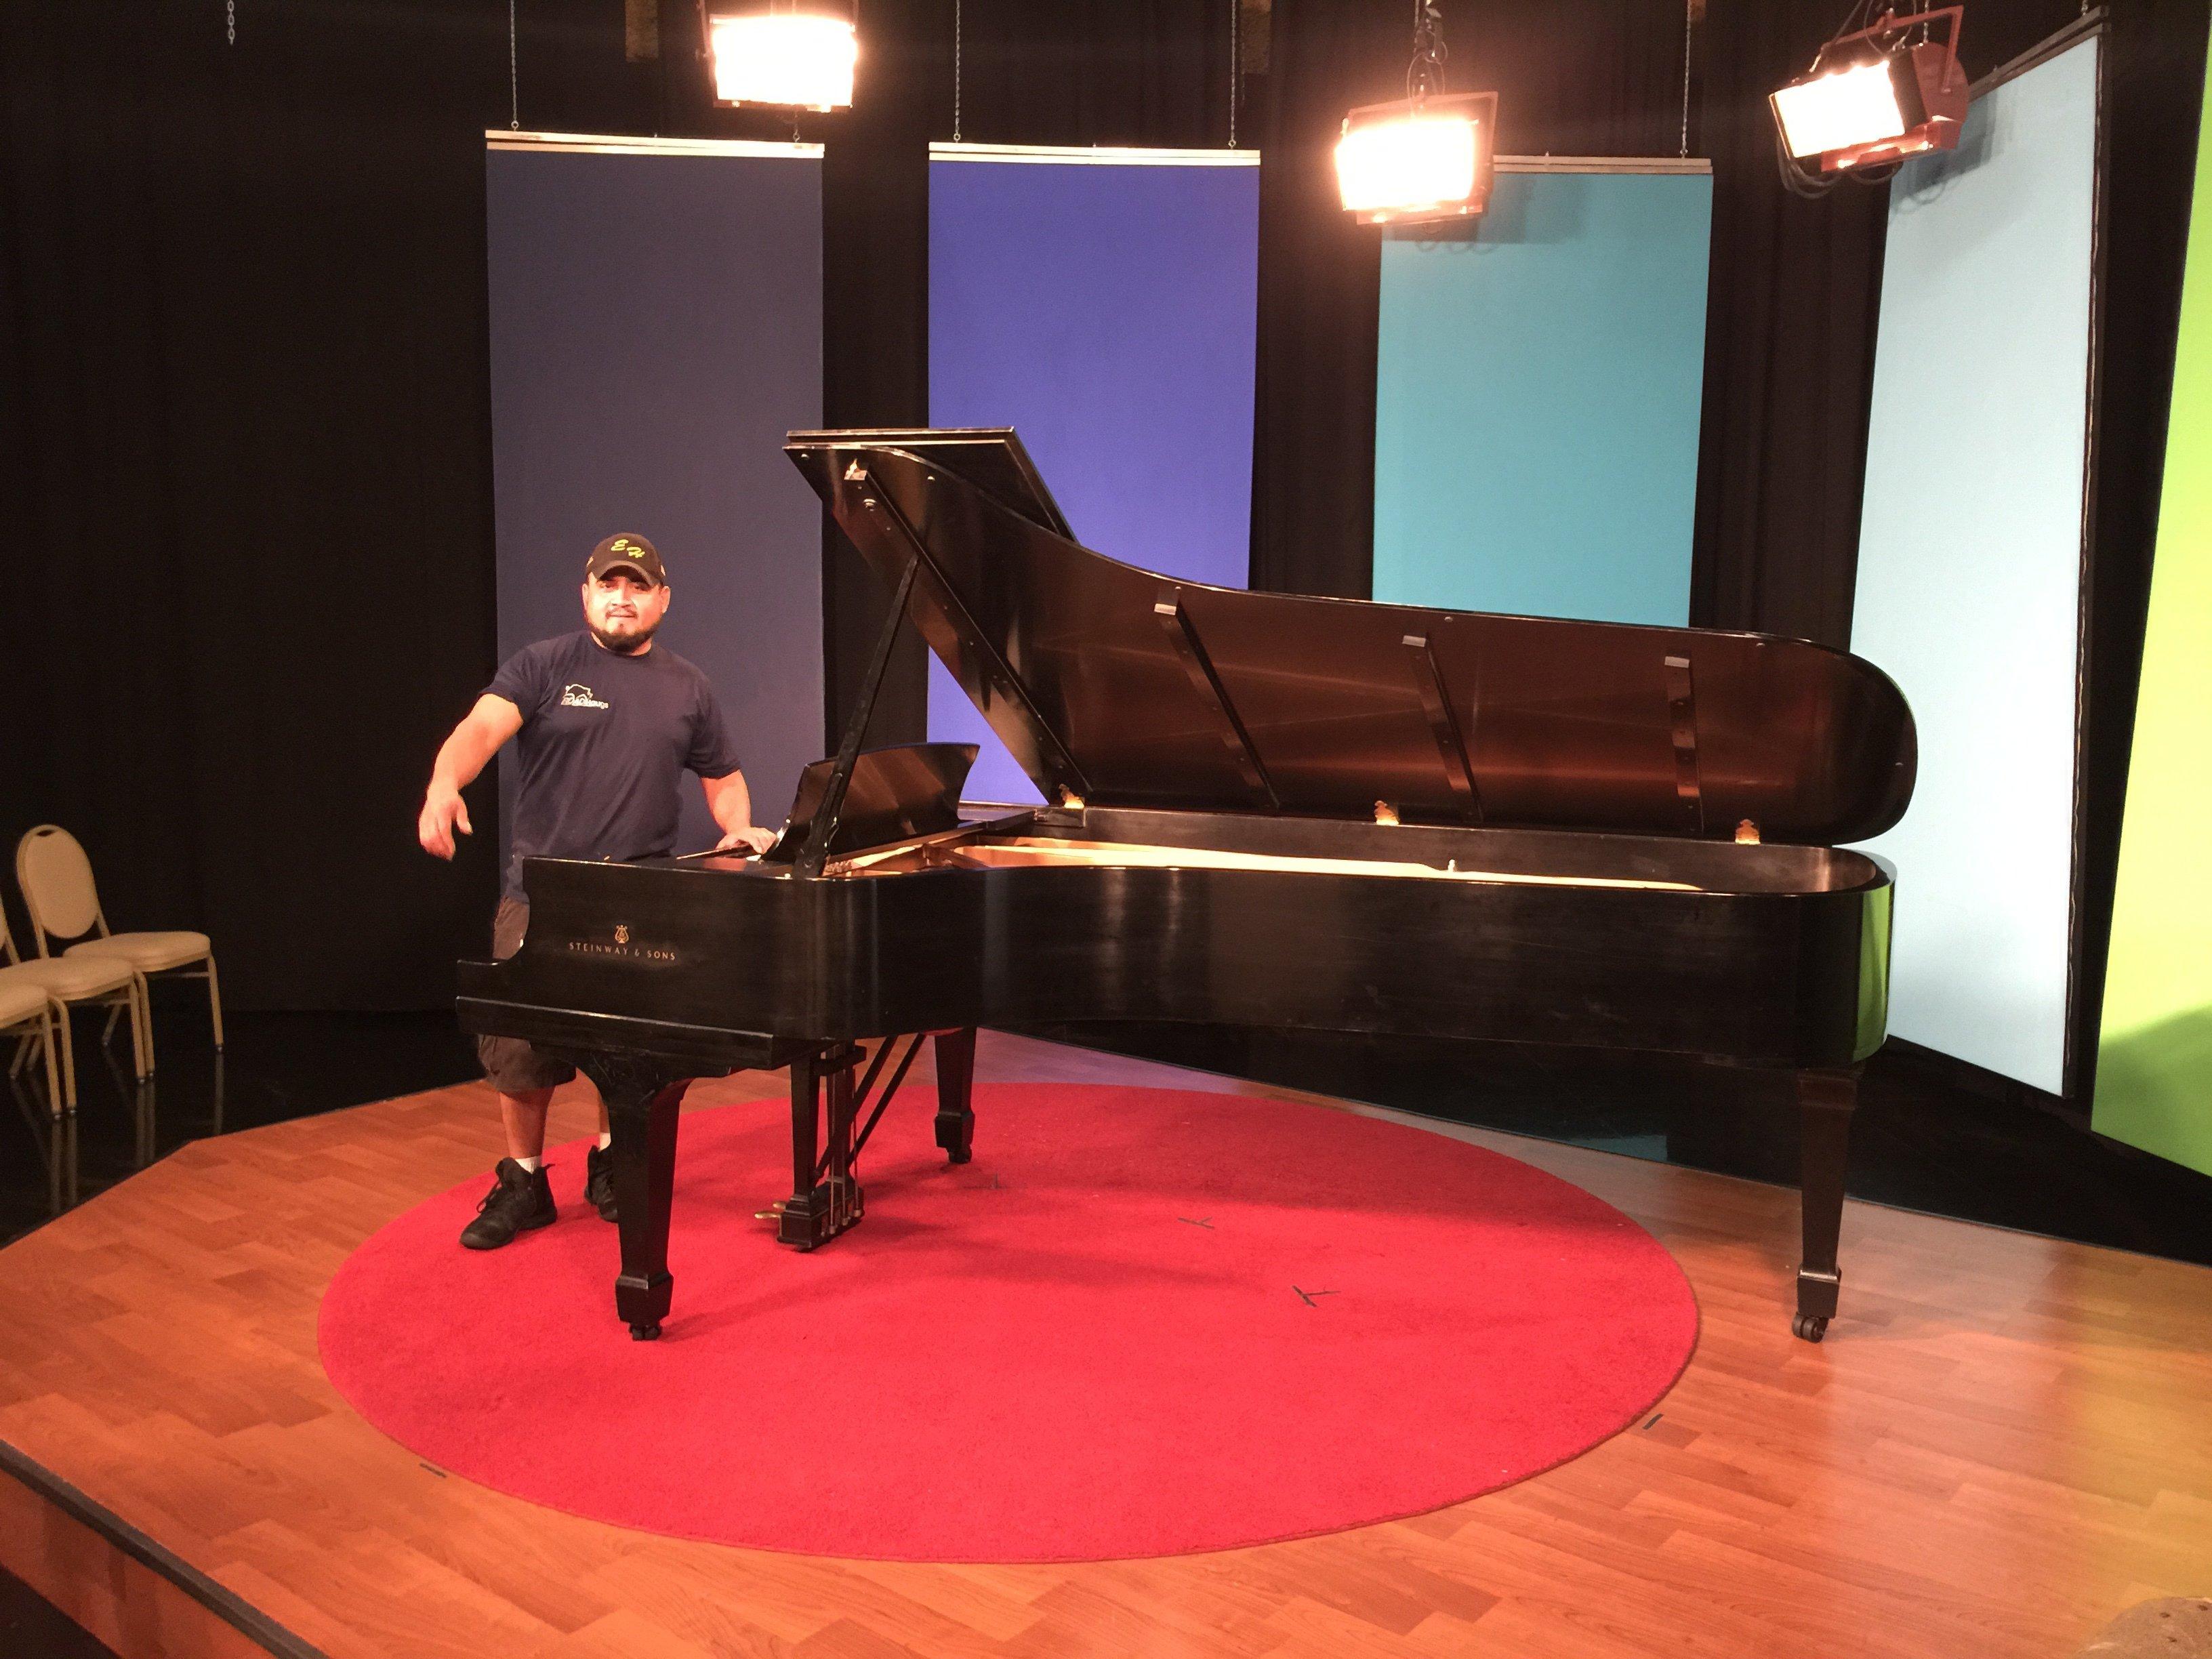 Piano Movers Charlotte, NC